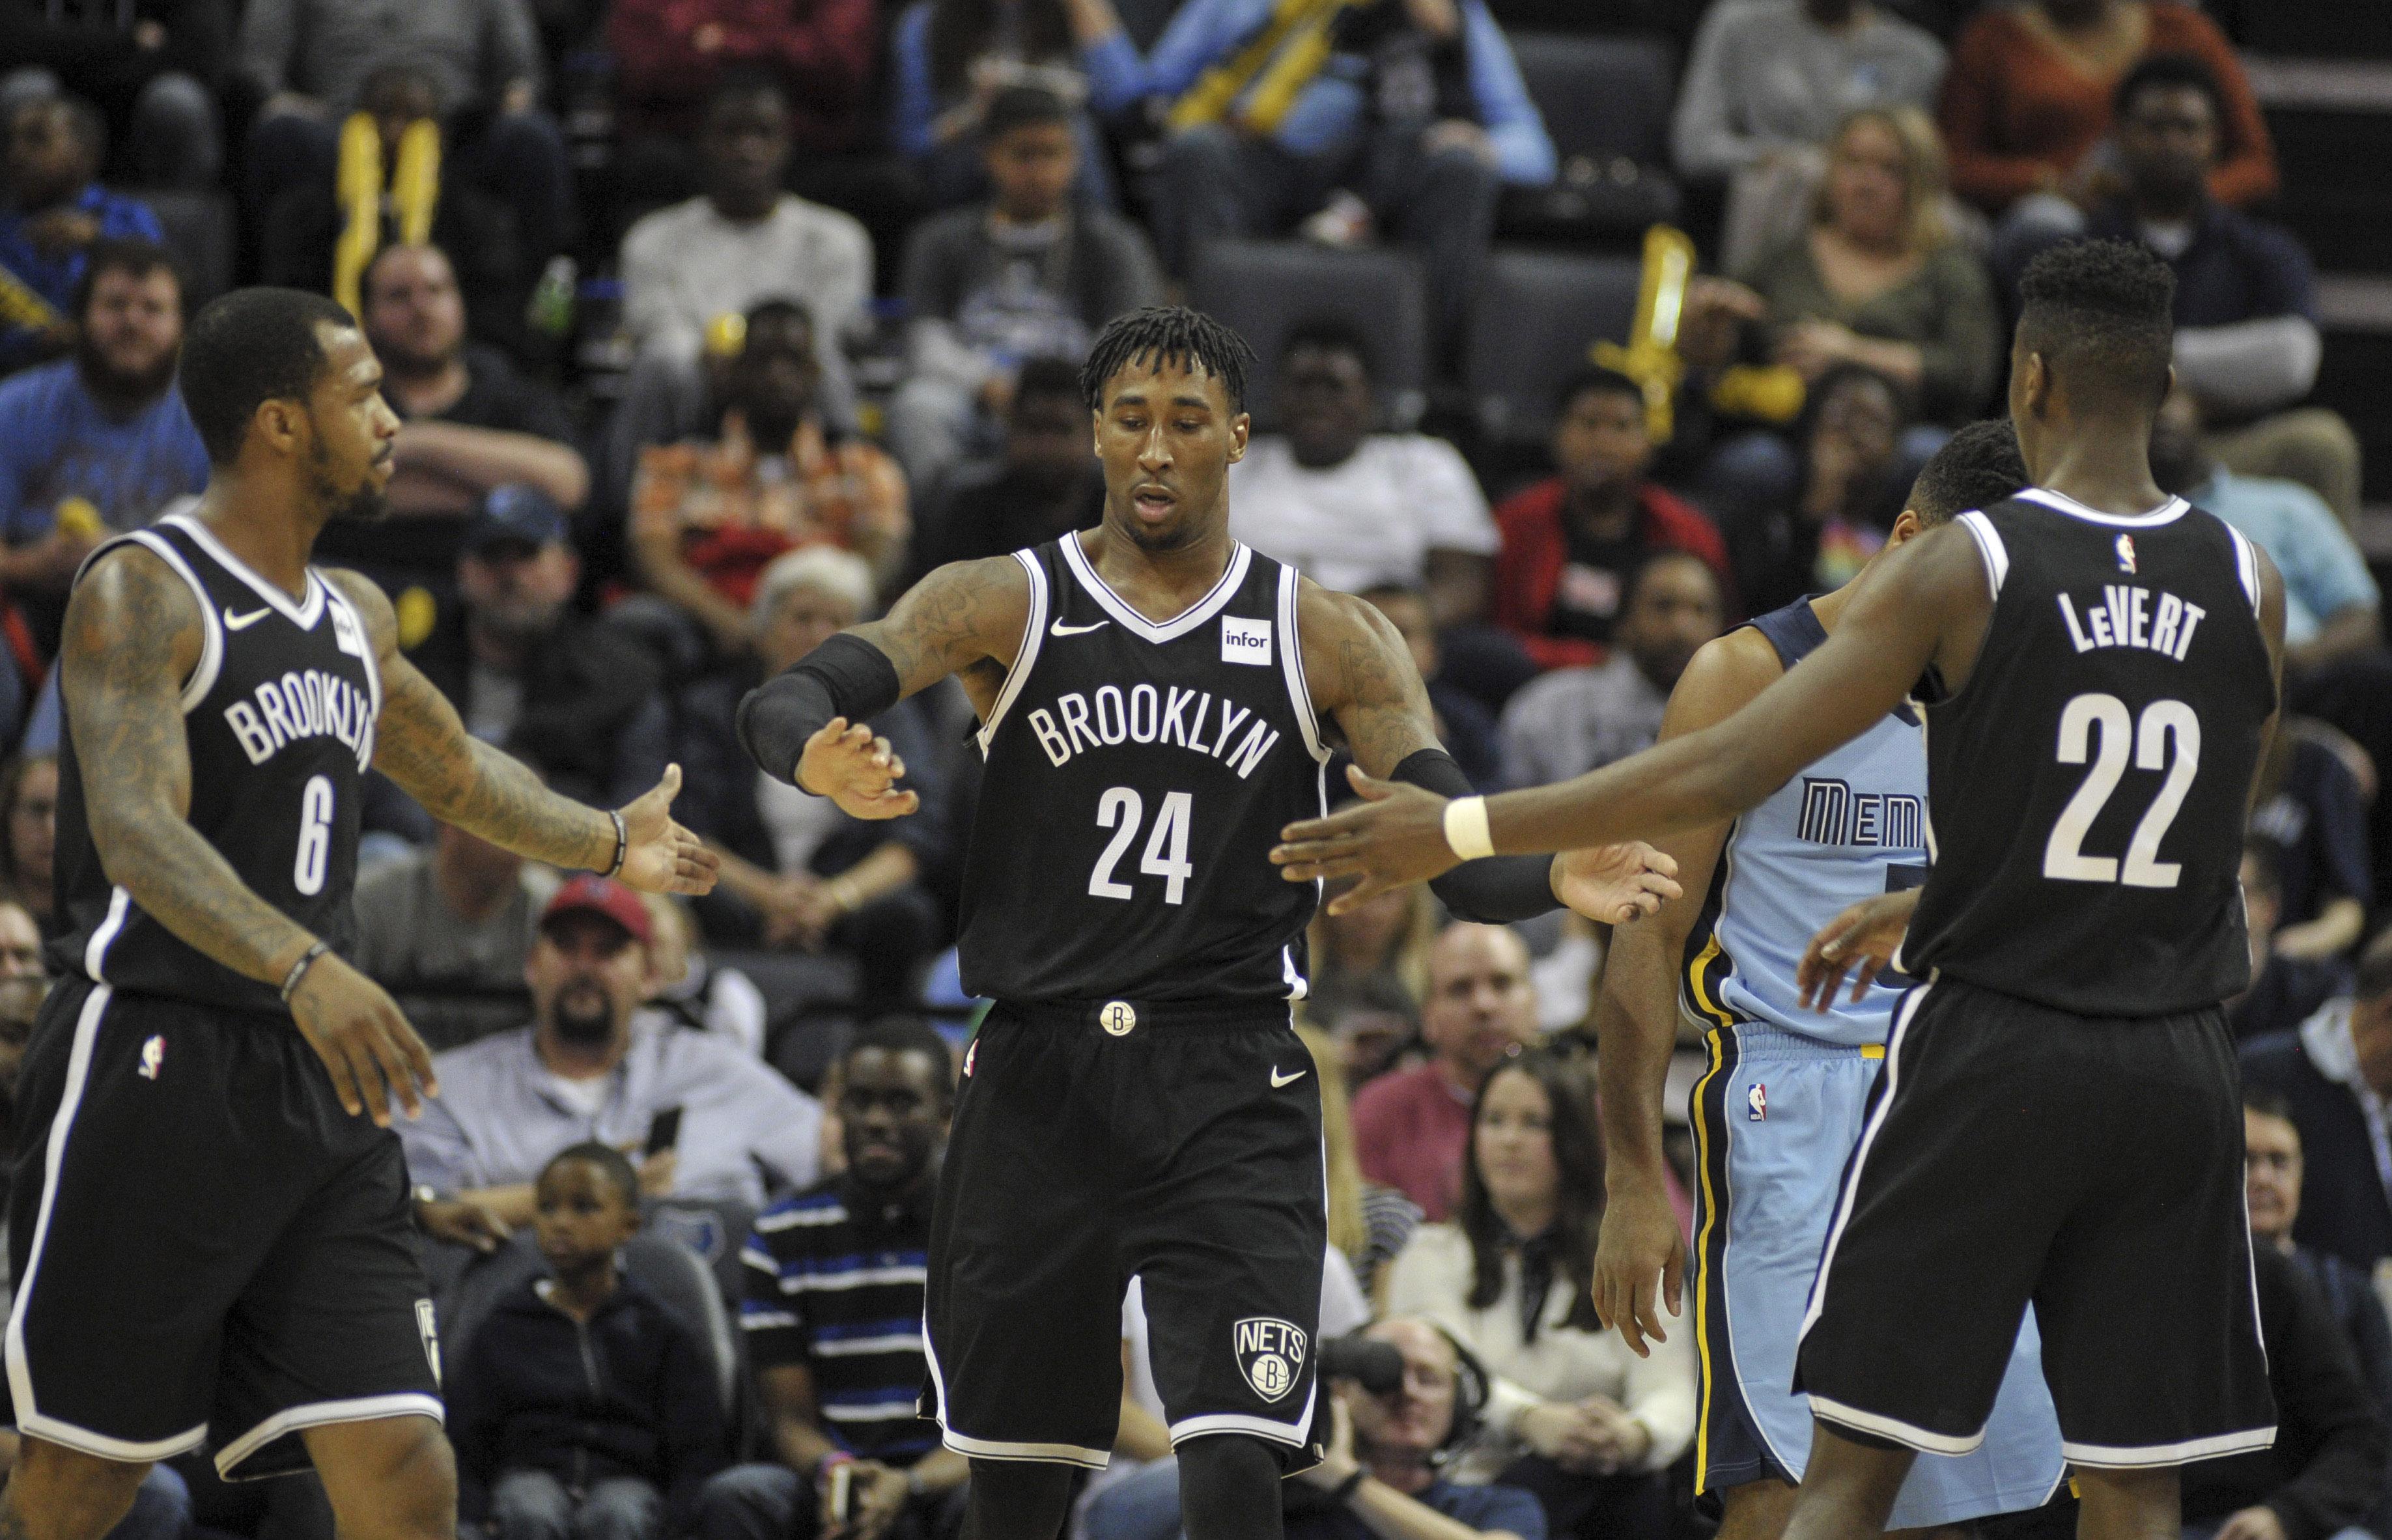 NBA: Brooklyn Nets at Memphis Grizzlies